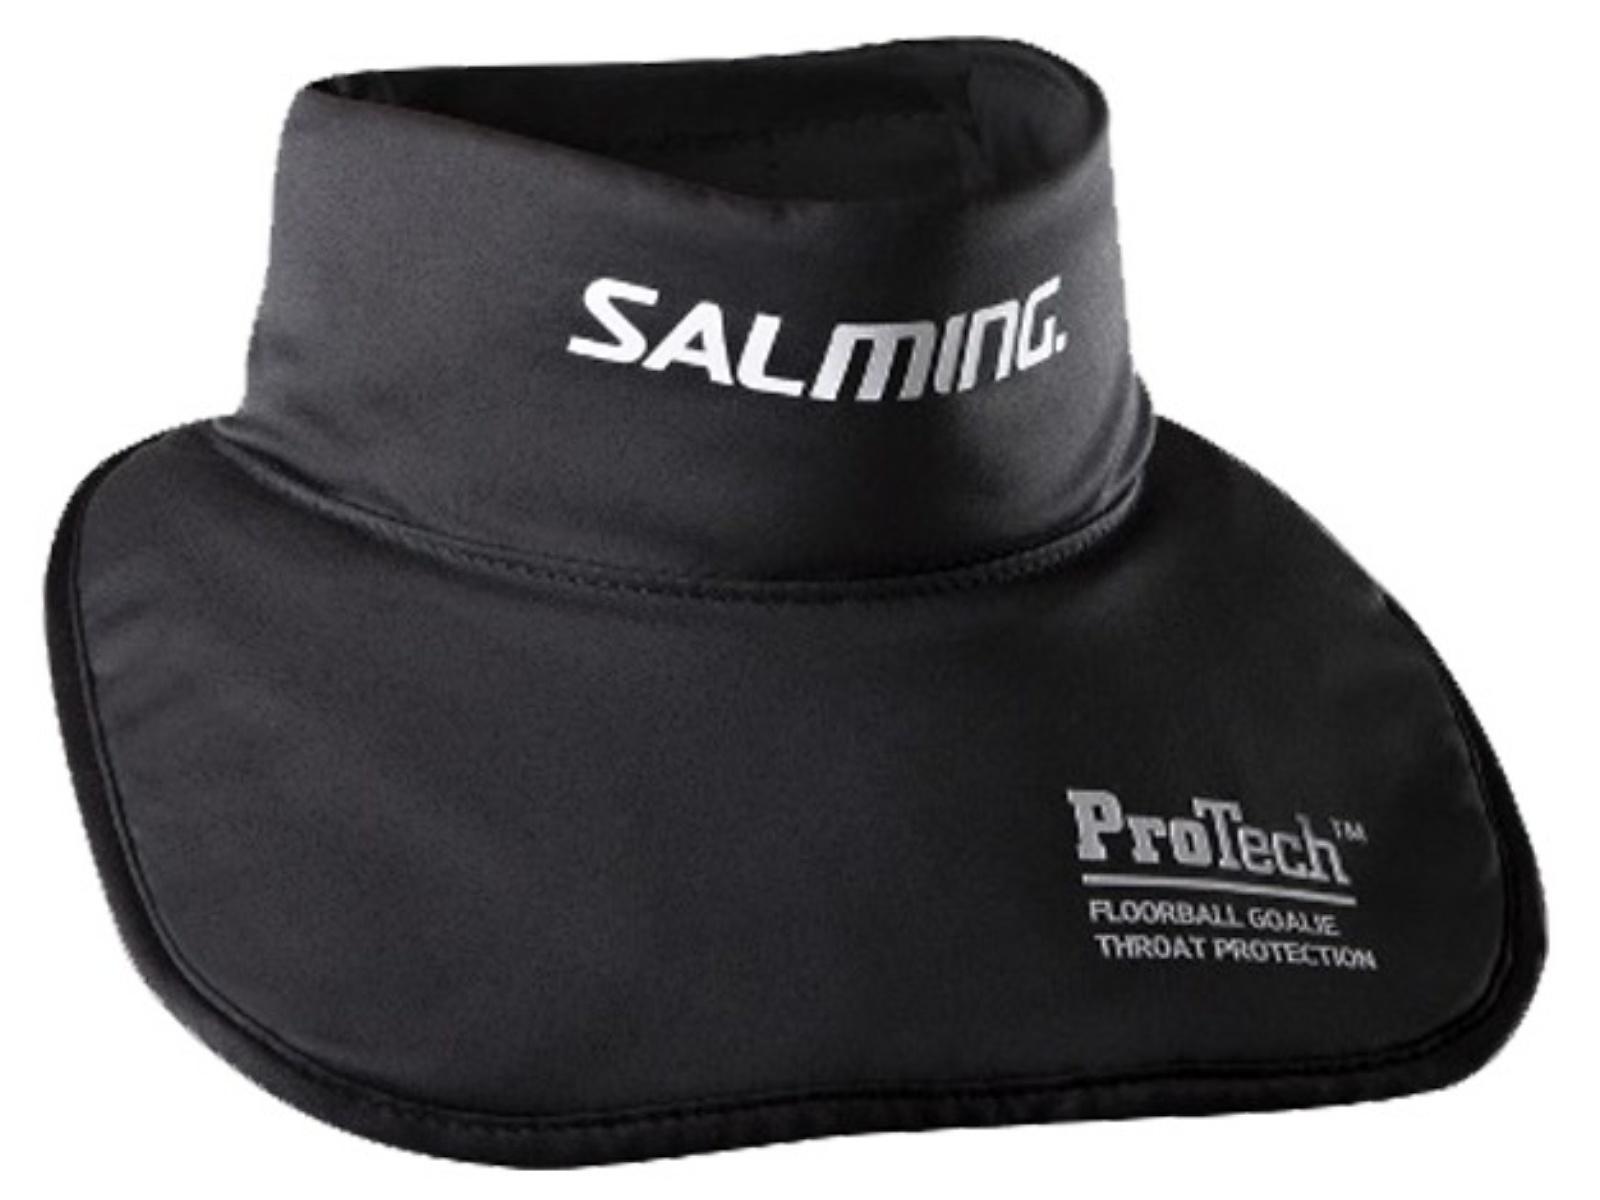 Ochranný límec SALMING ProTech Throat Protection